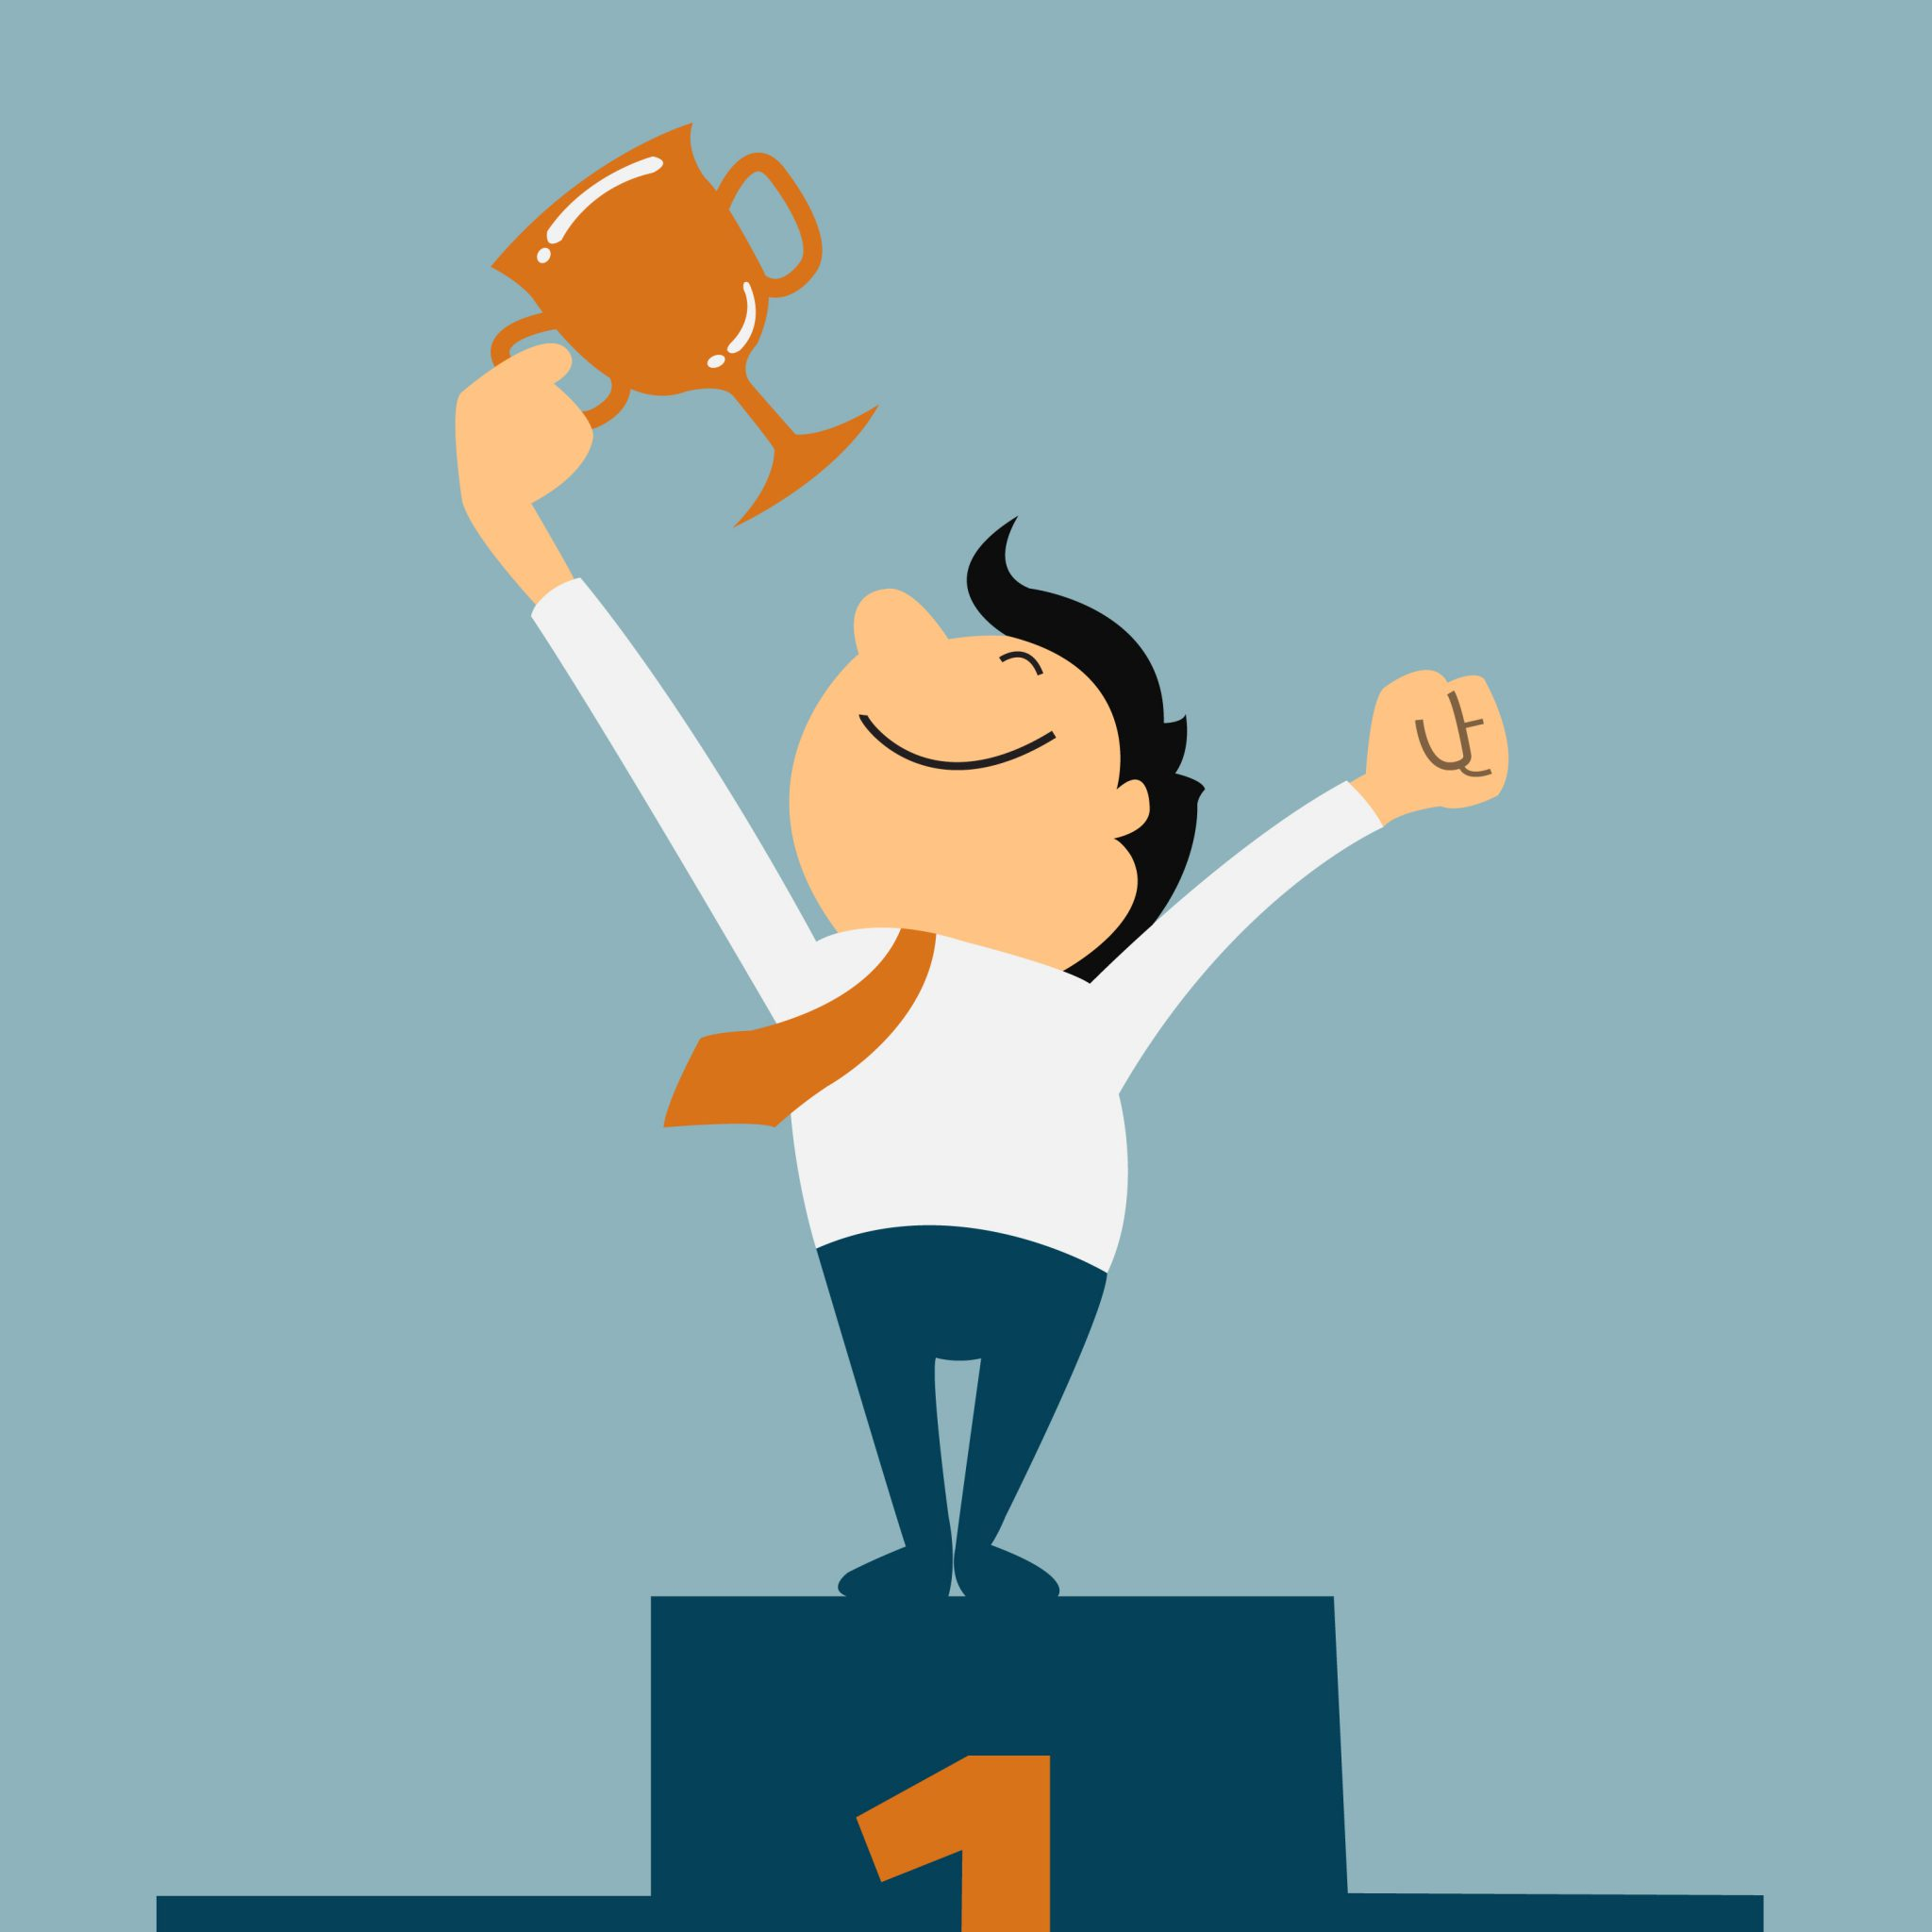 7 Award Winning Employee Engagement Strategies